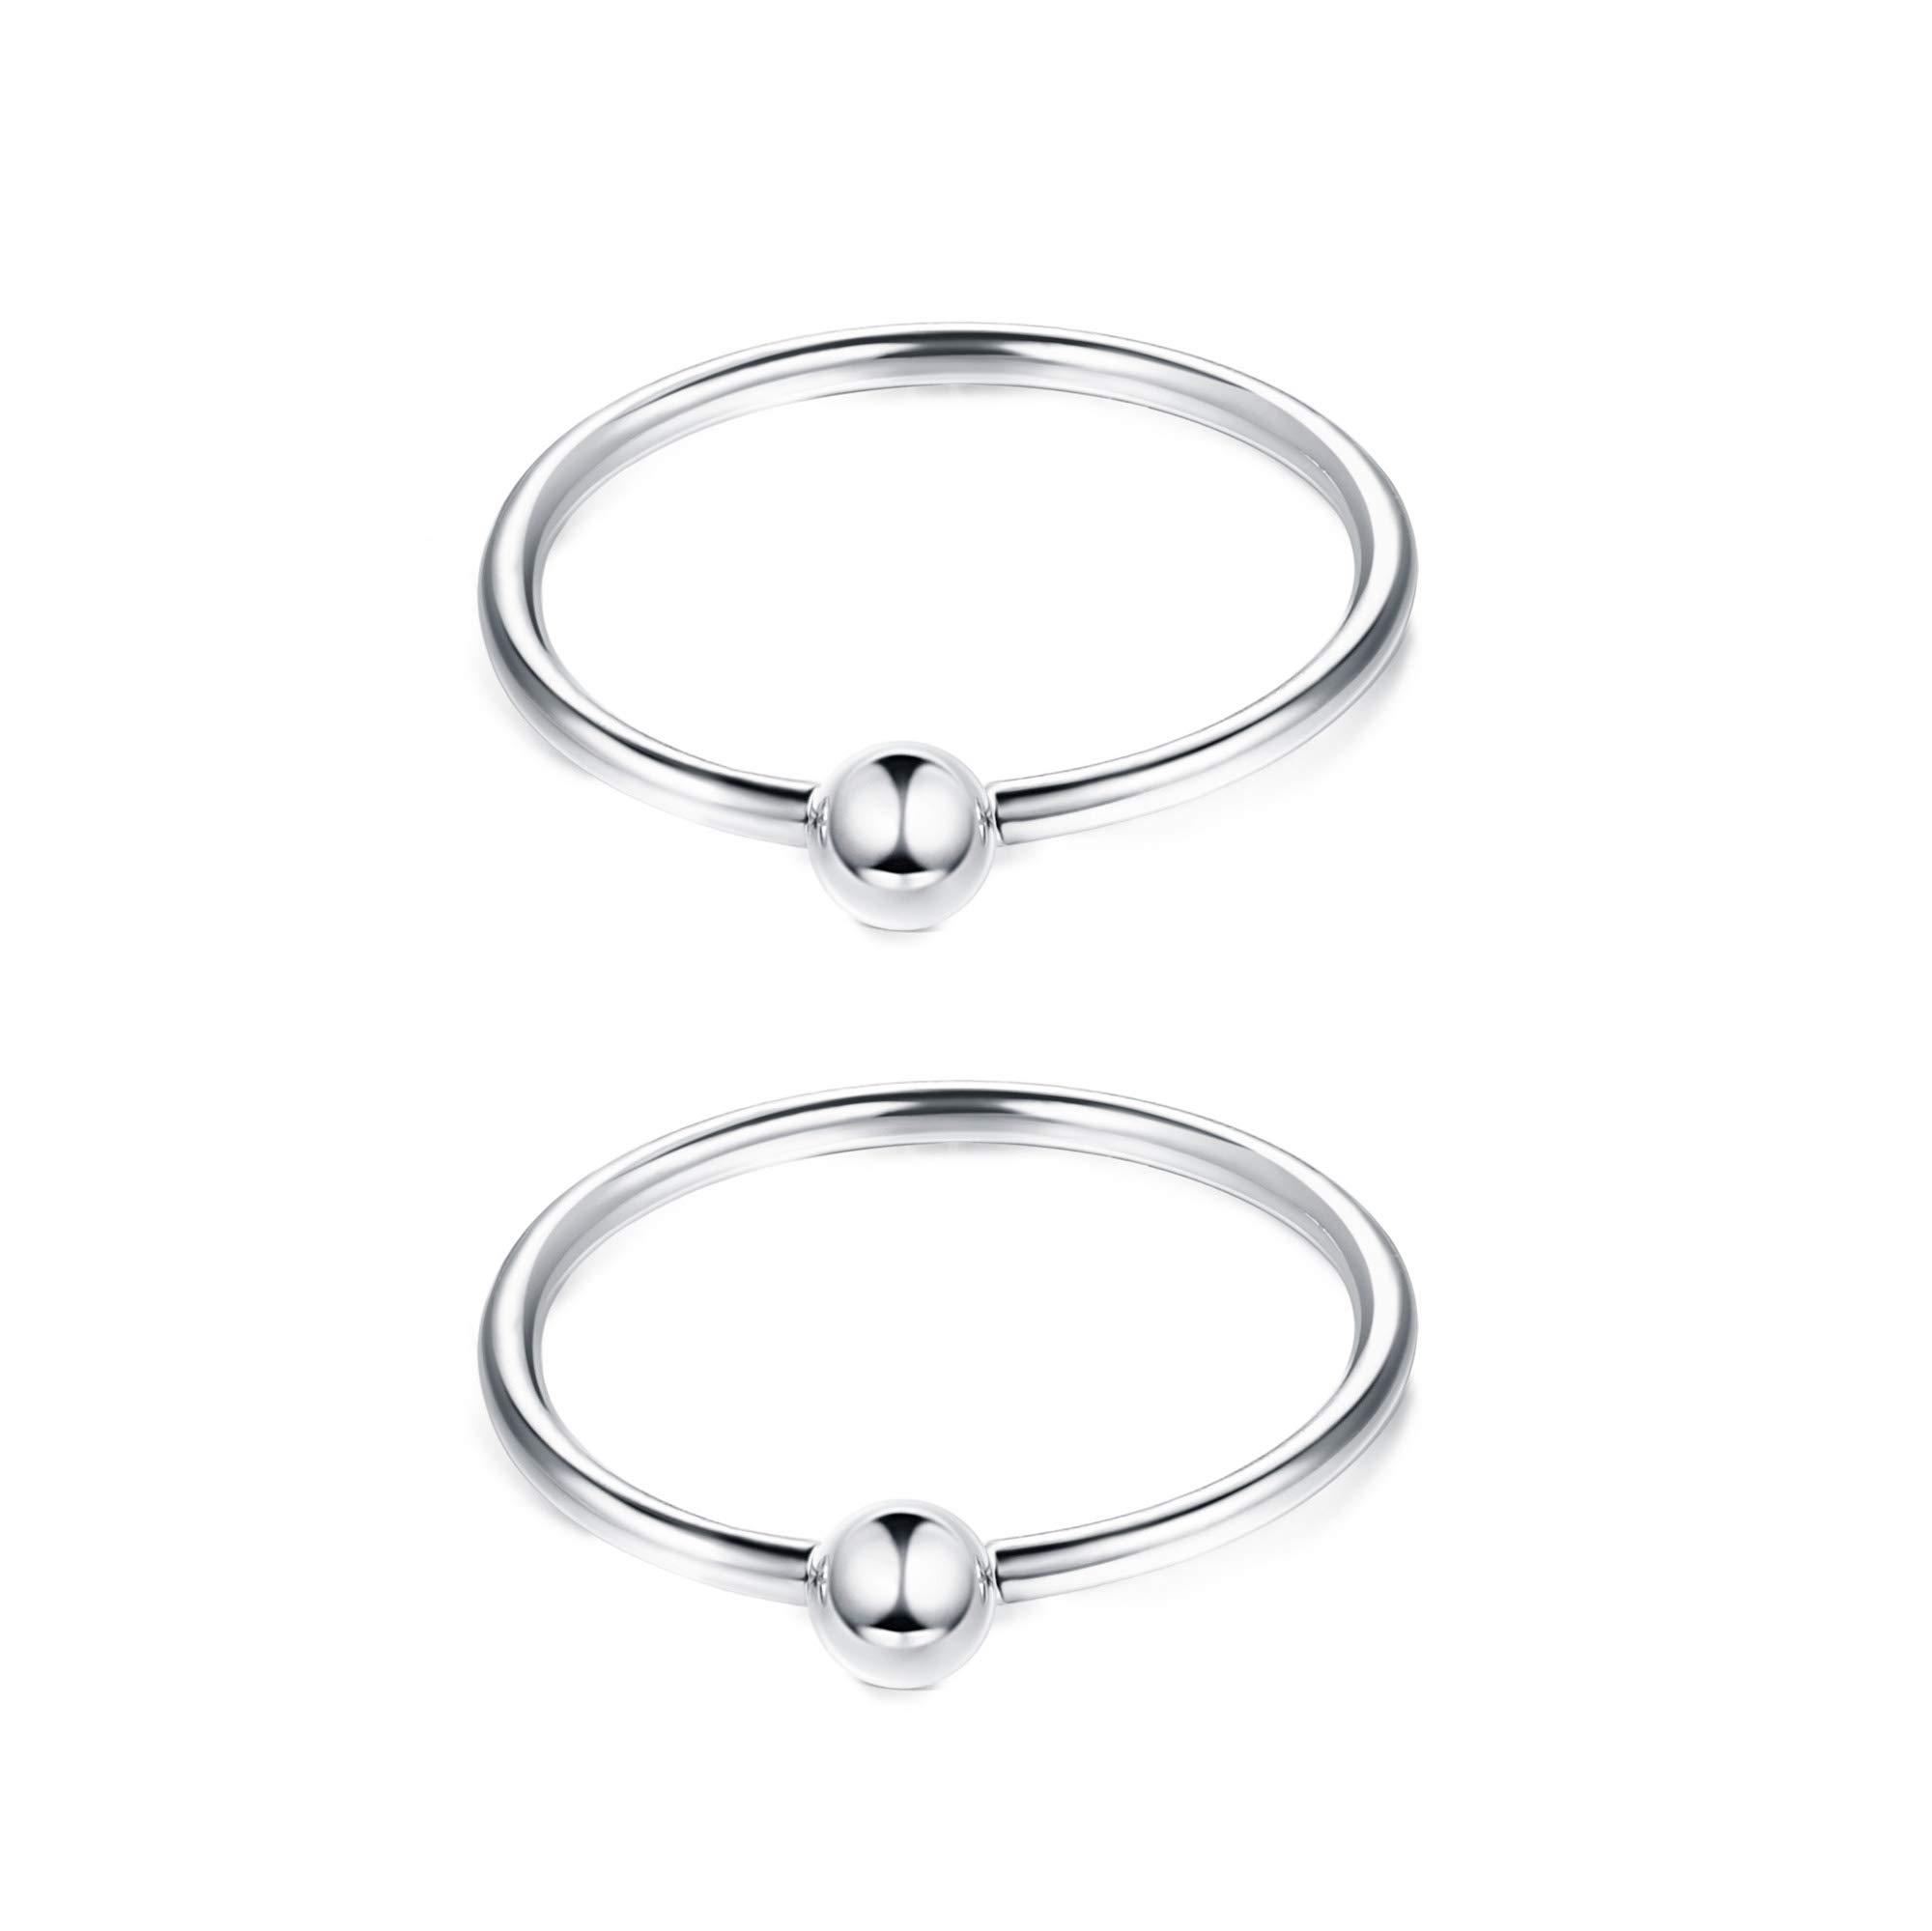 Sllaiss 0.6MM Small Bead Nose Rings Hoop for Women Men 925 Sterling Silver Hoop Cartilage Earrings Body Piercing